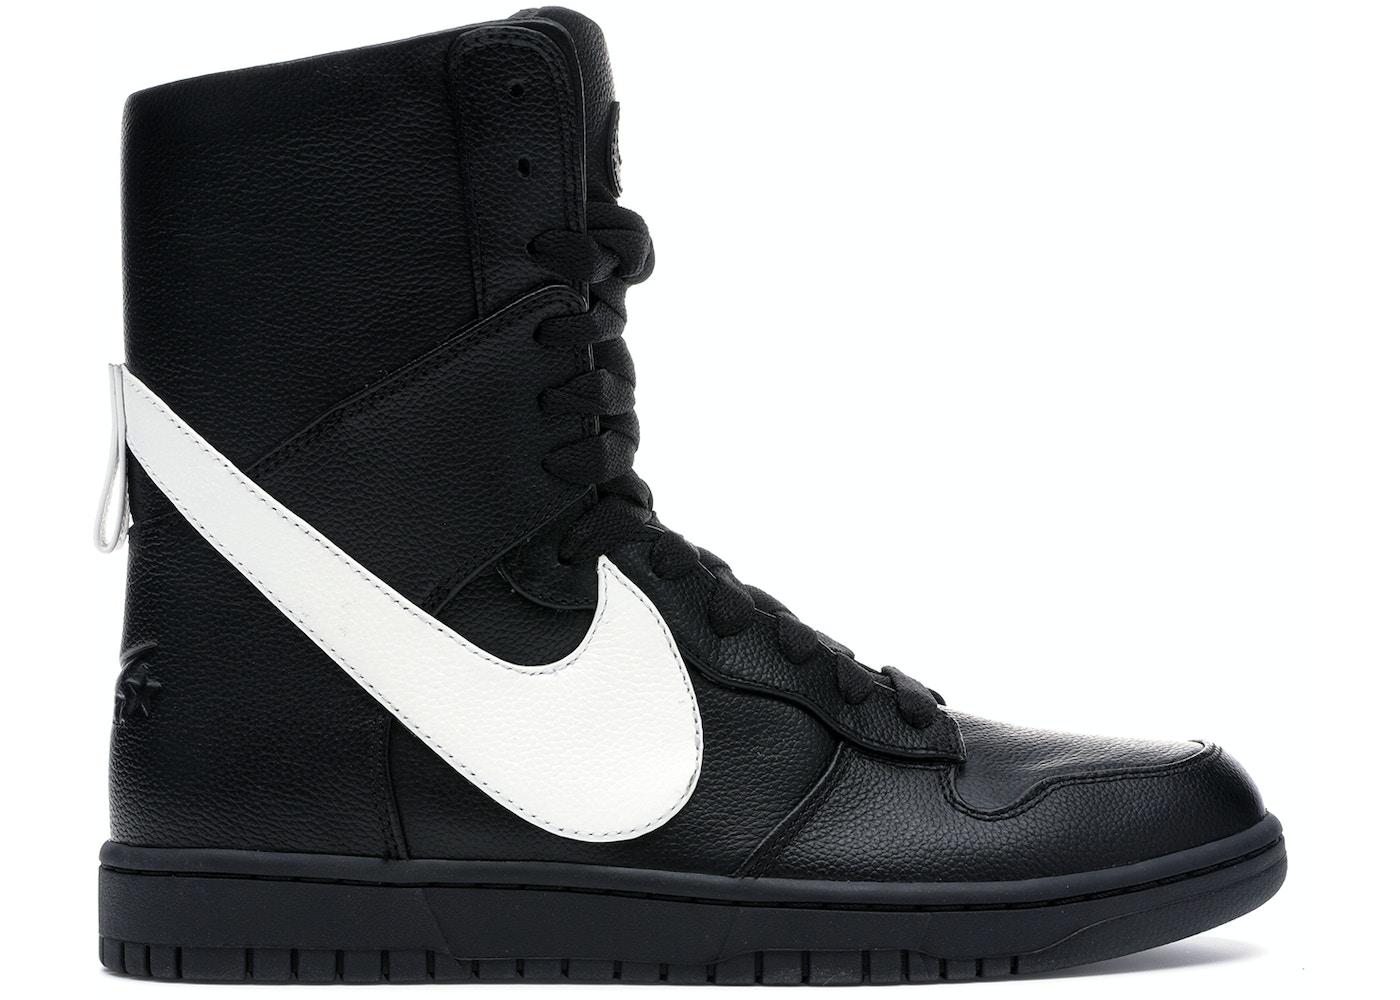 separation shoes 48b5e ef106 Nike Dunk High Lux Tisci Black